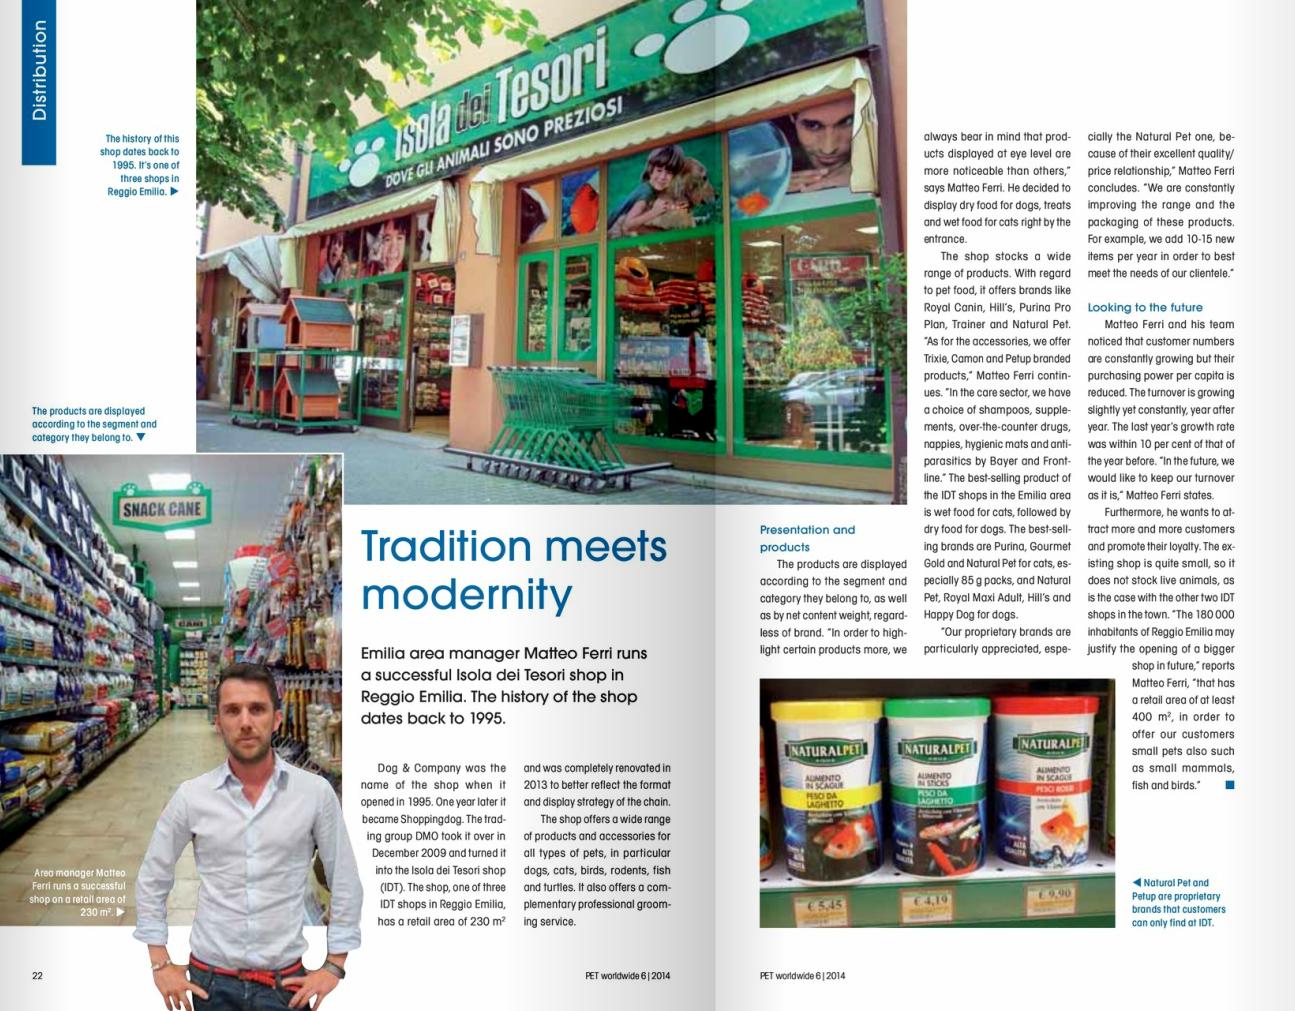 isoladeitesori-tradition-meats-modernity